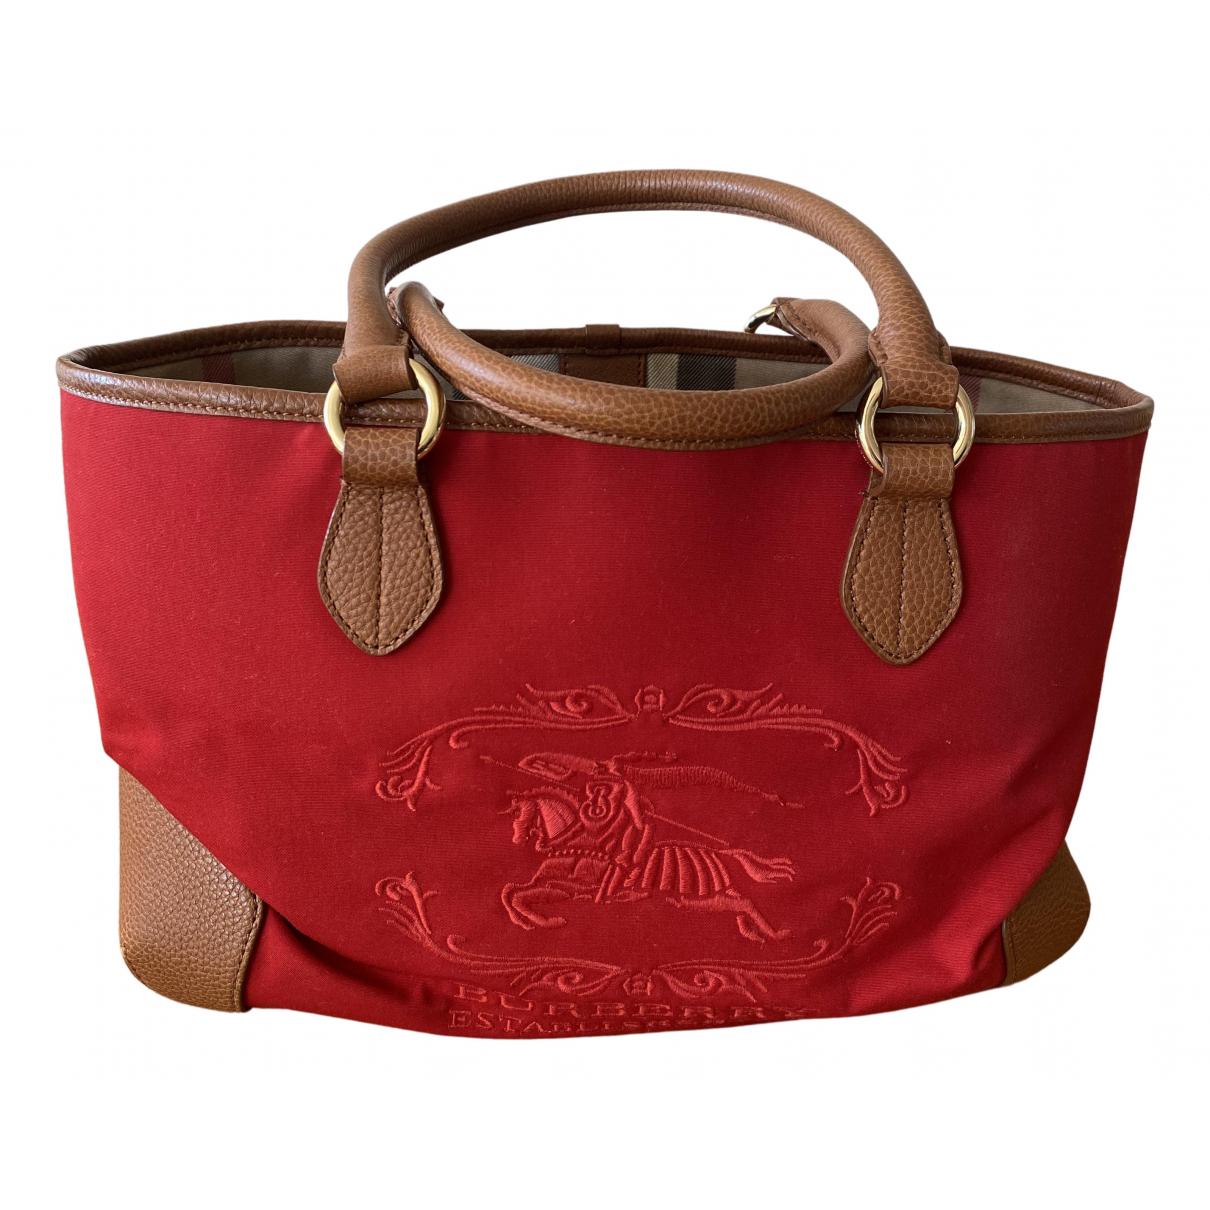 Burberry \N Red Cotton handbag for Women \N